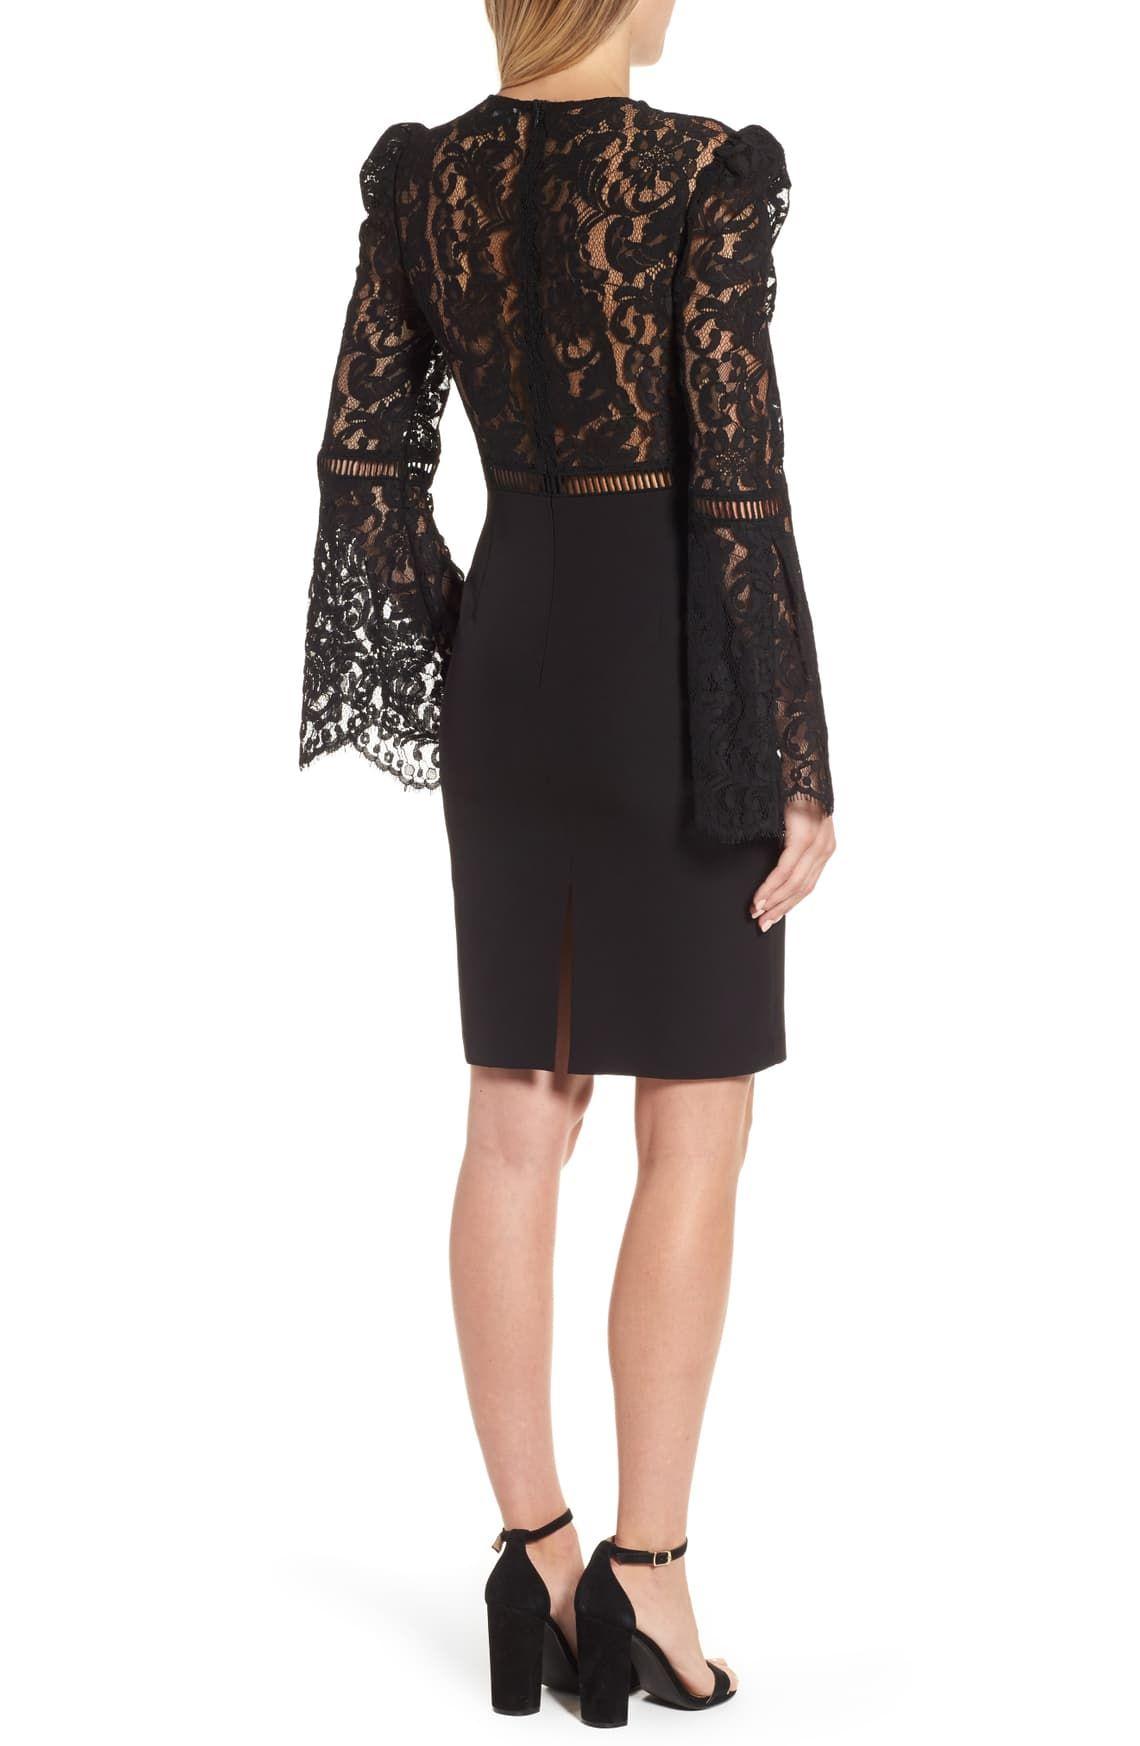 Bardot Lace Bodice Cocktail Dress Nordstrom Cocktail Dress Little Black Cocktail Dress Dresses [ 1746 x 1140 Pixel ]